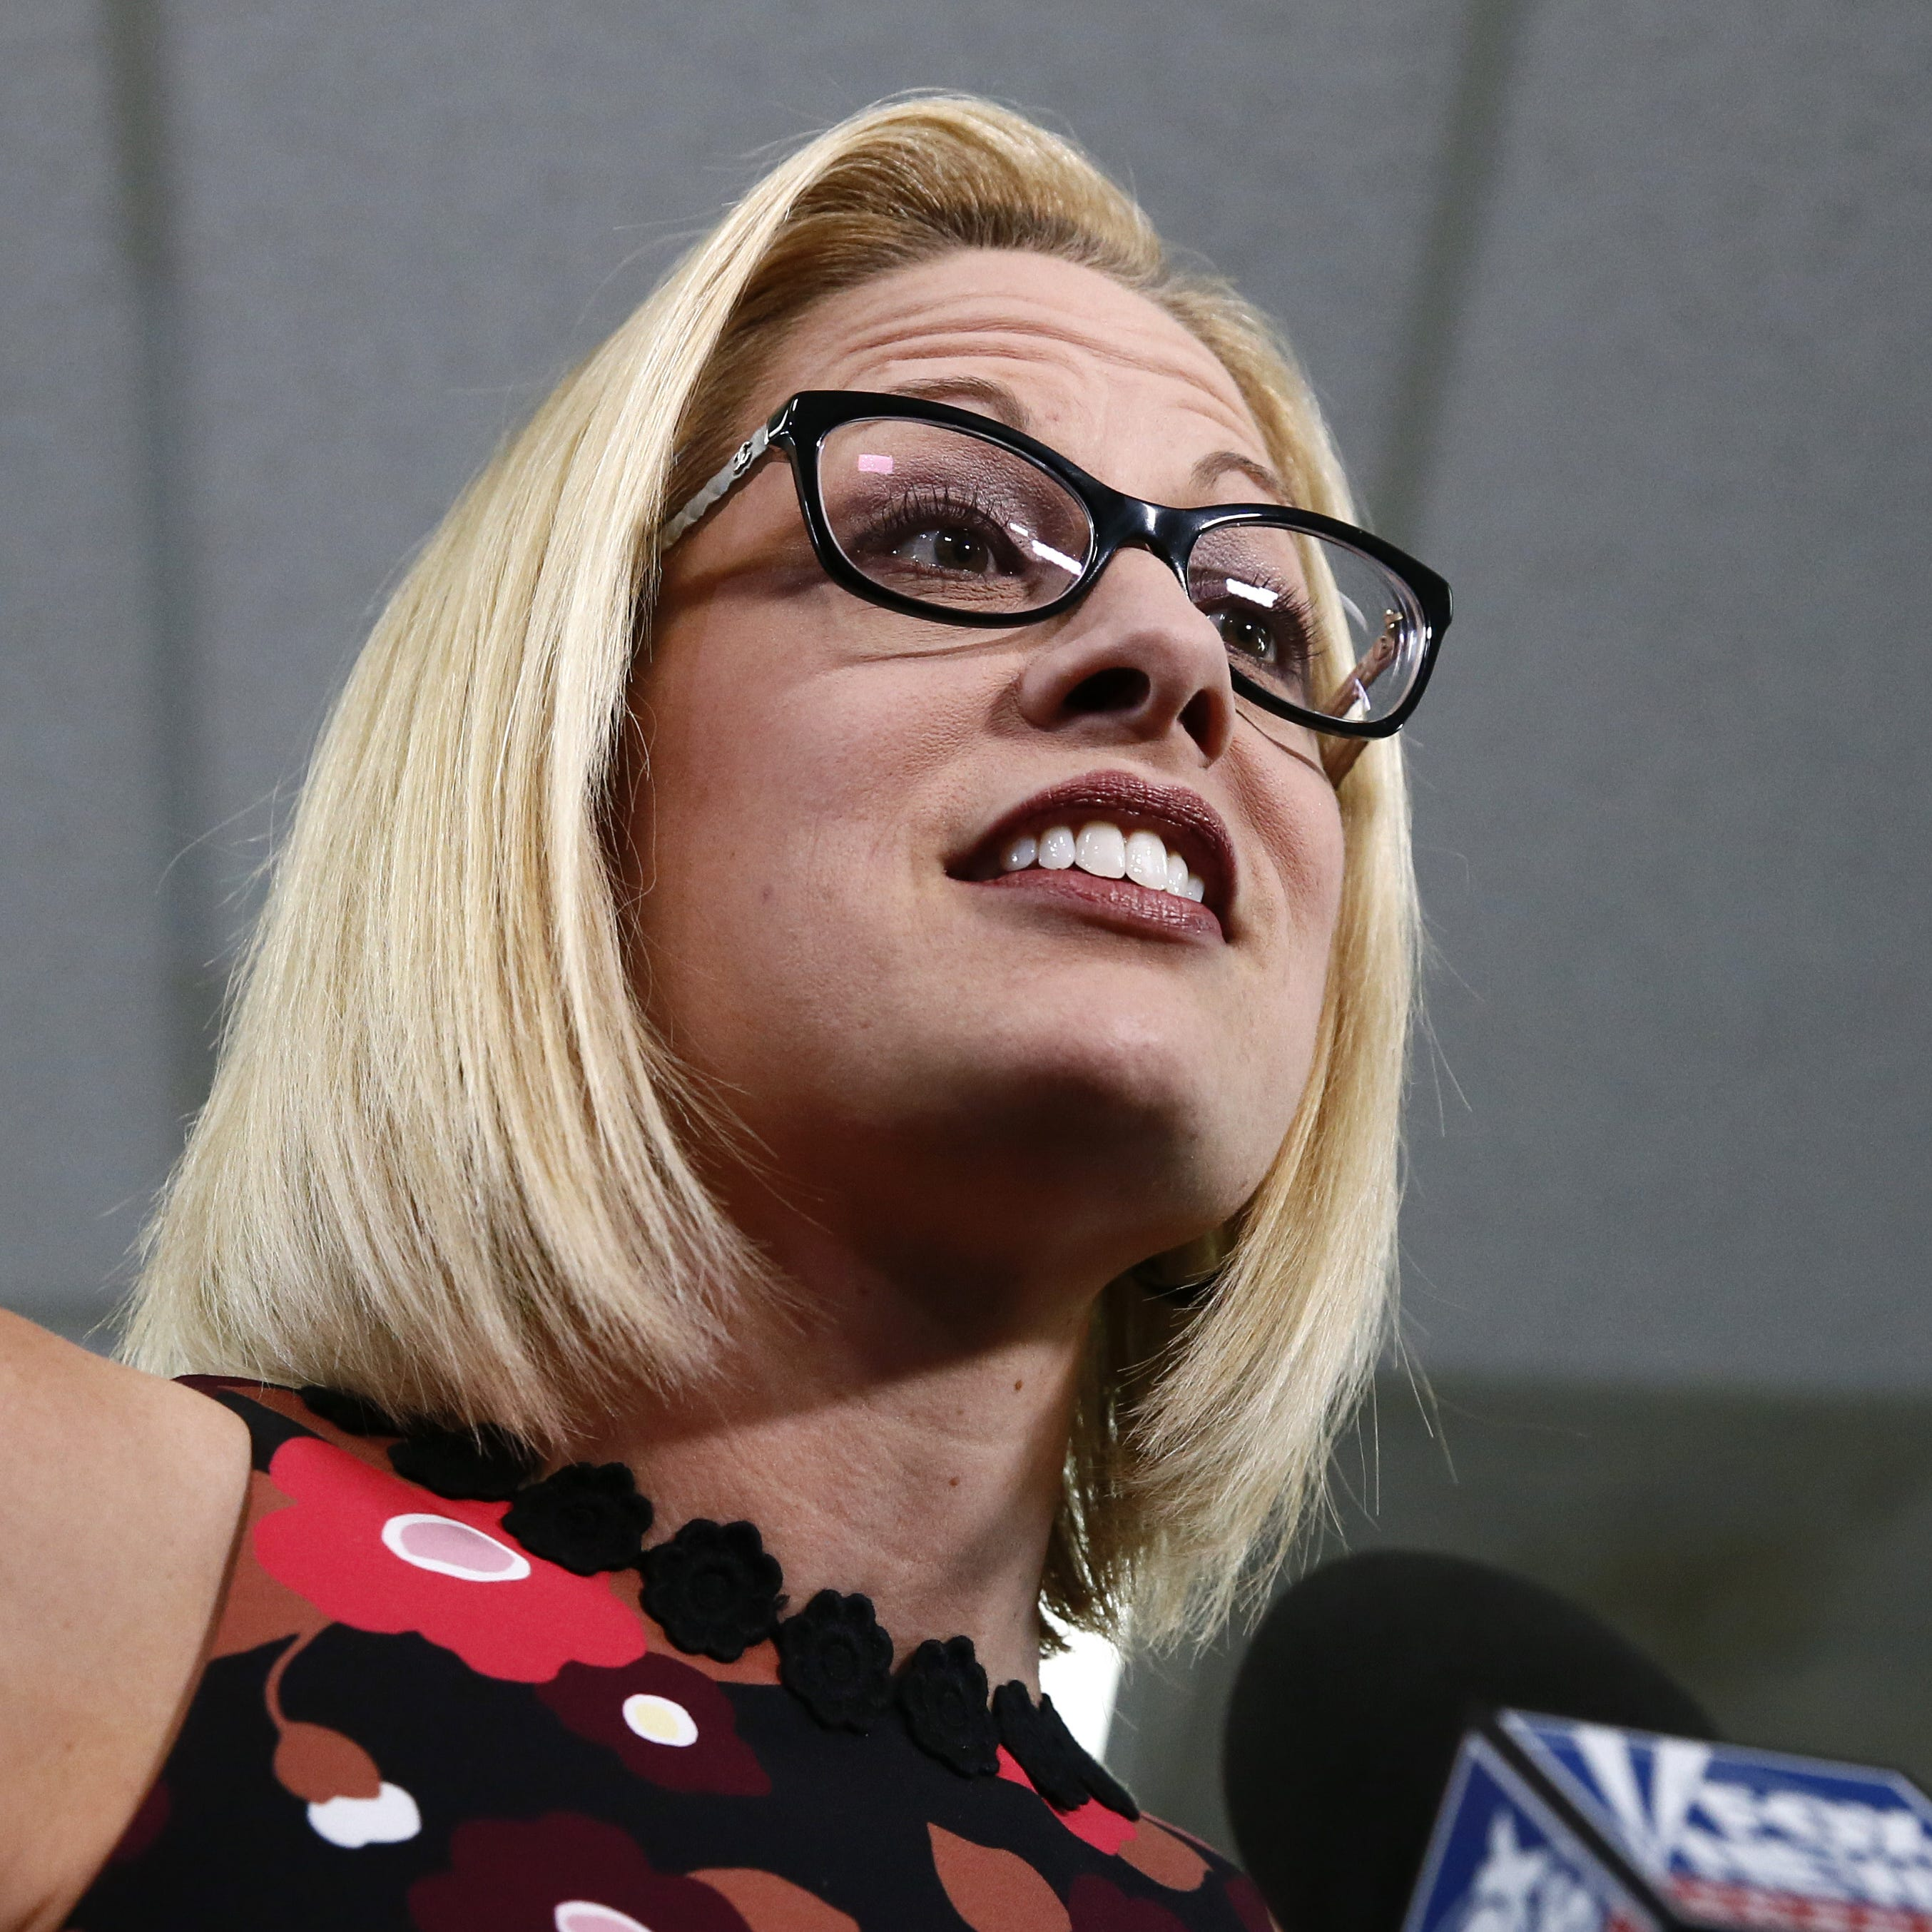 Kyrsten Sinema beats Martha McSally to become Arizona's first female senator